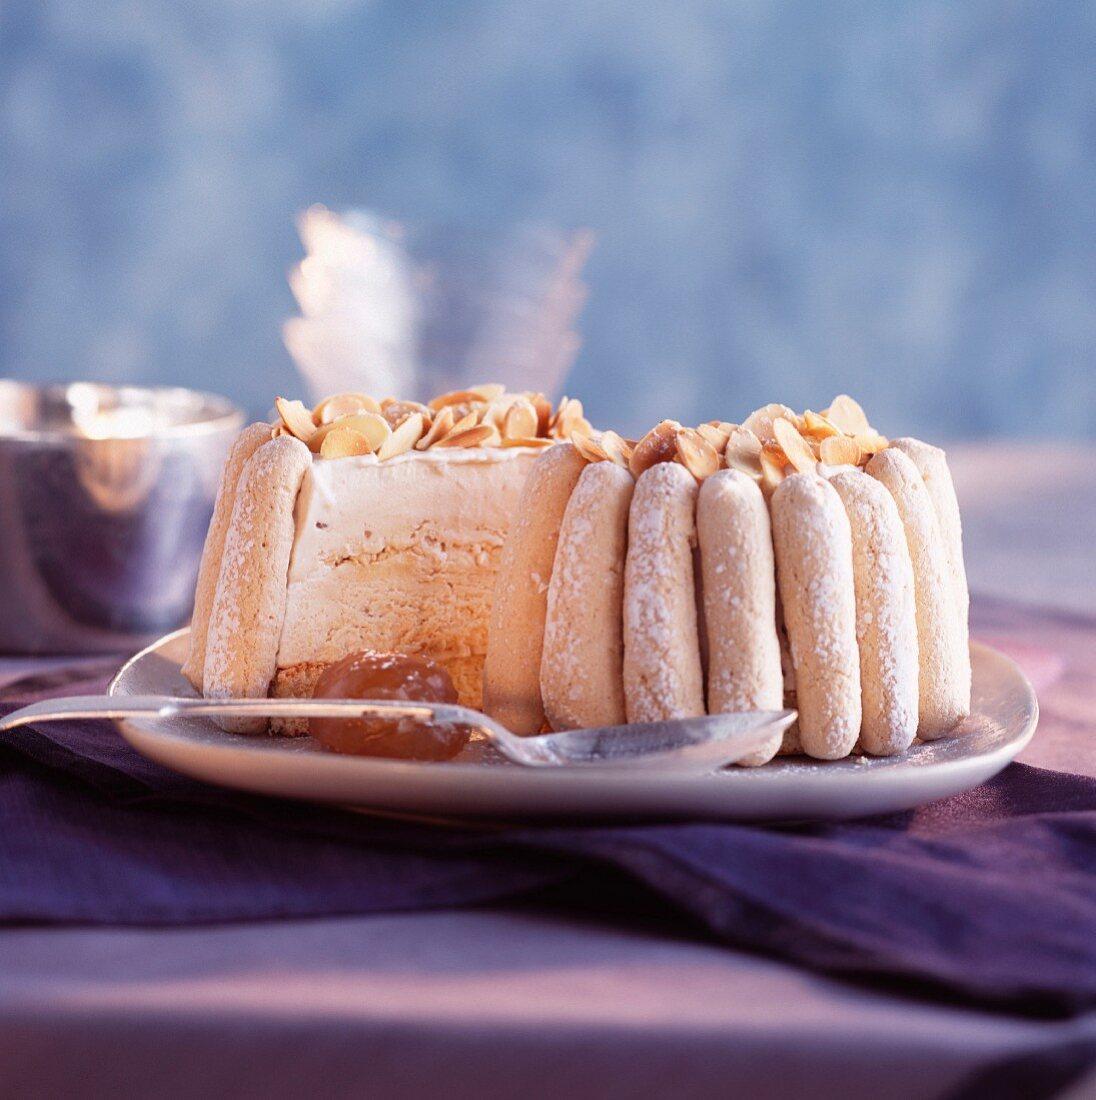 Ice cream and meringue Vacherin dessert